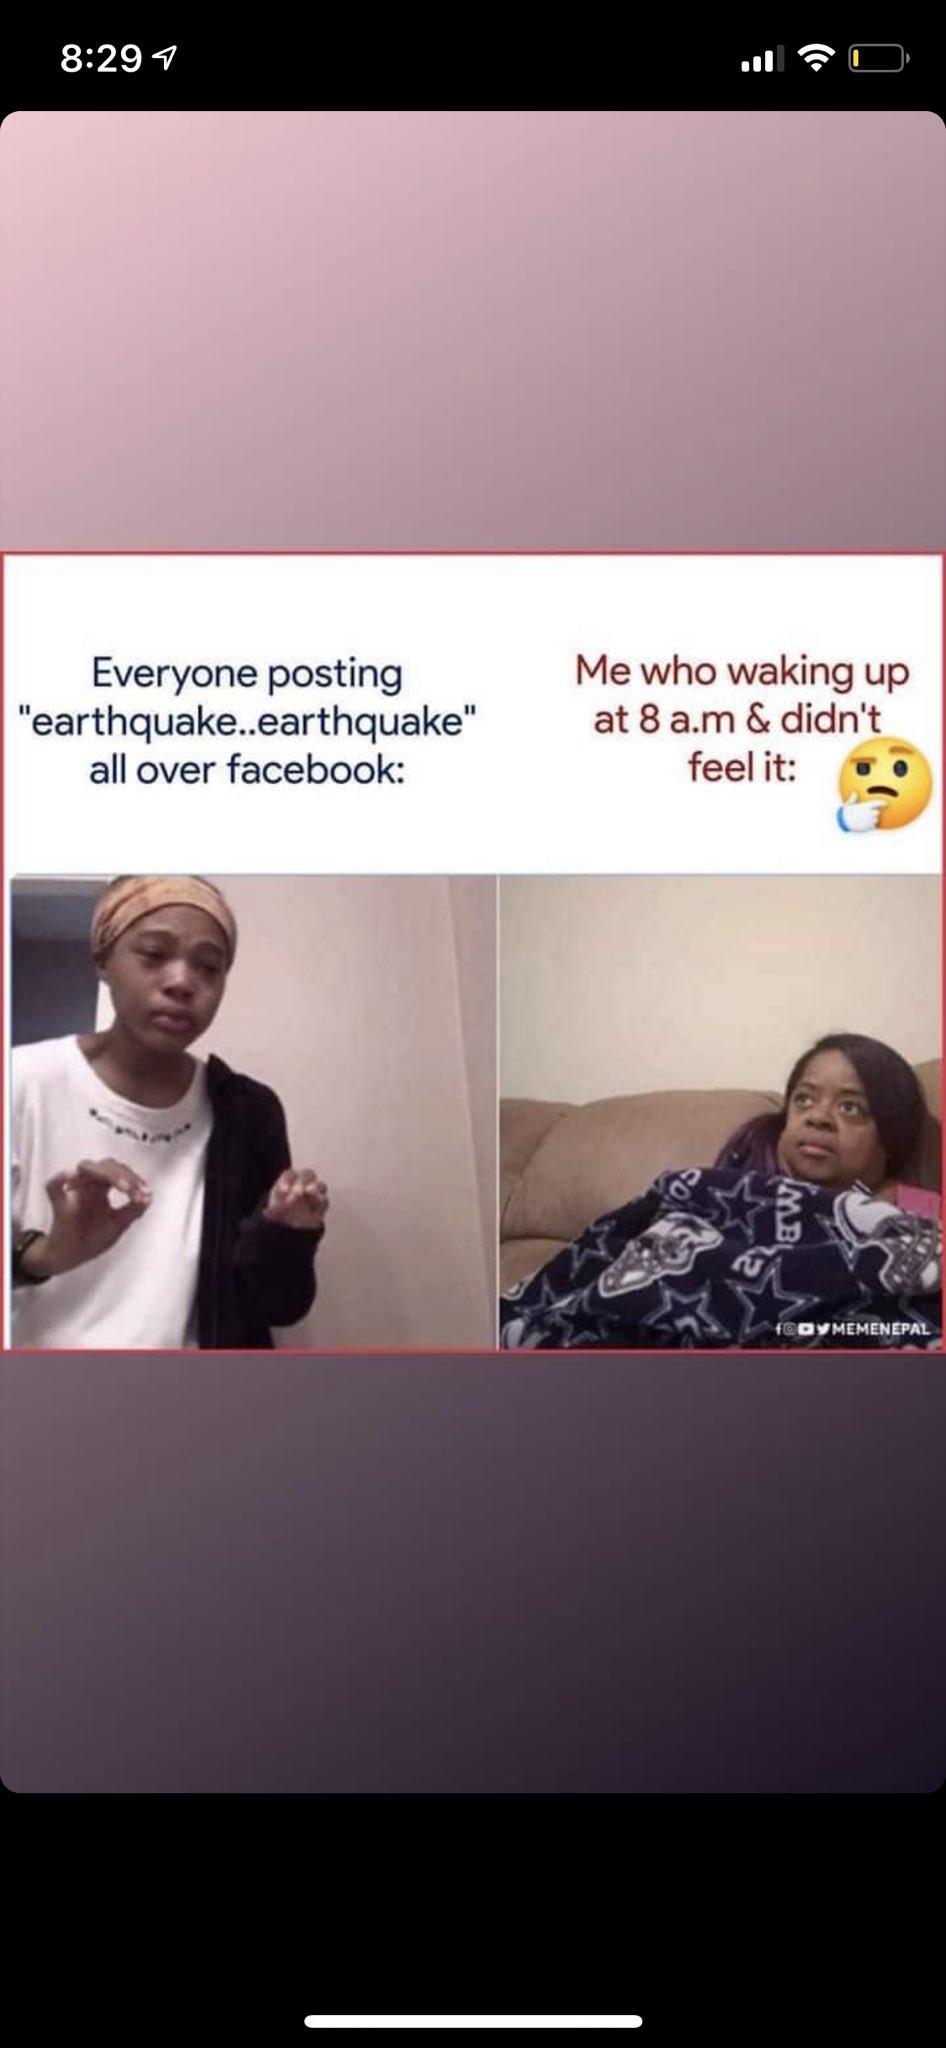 #earthquake Photo